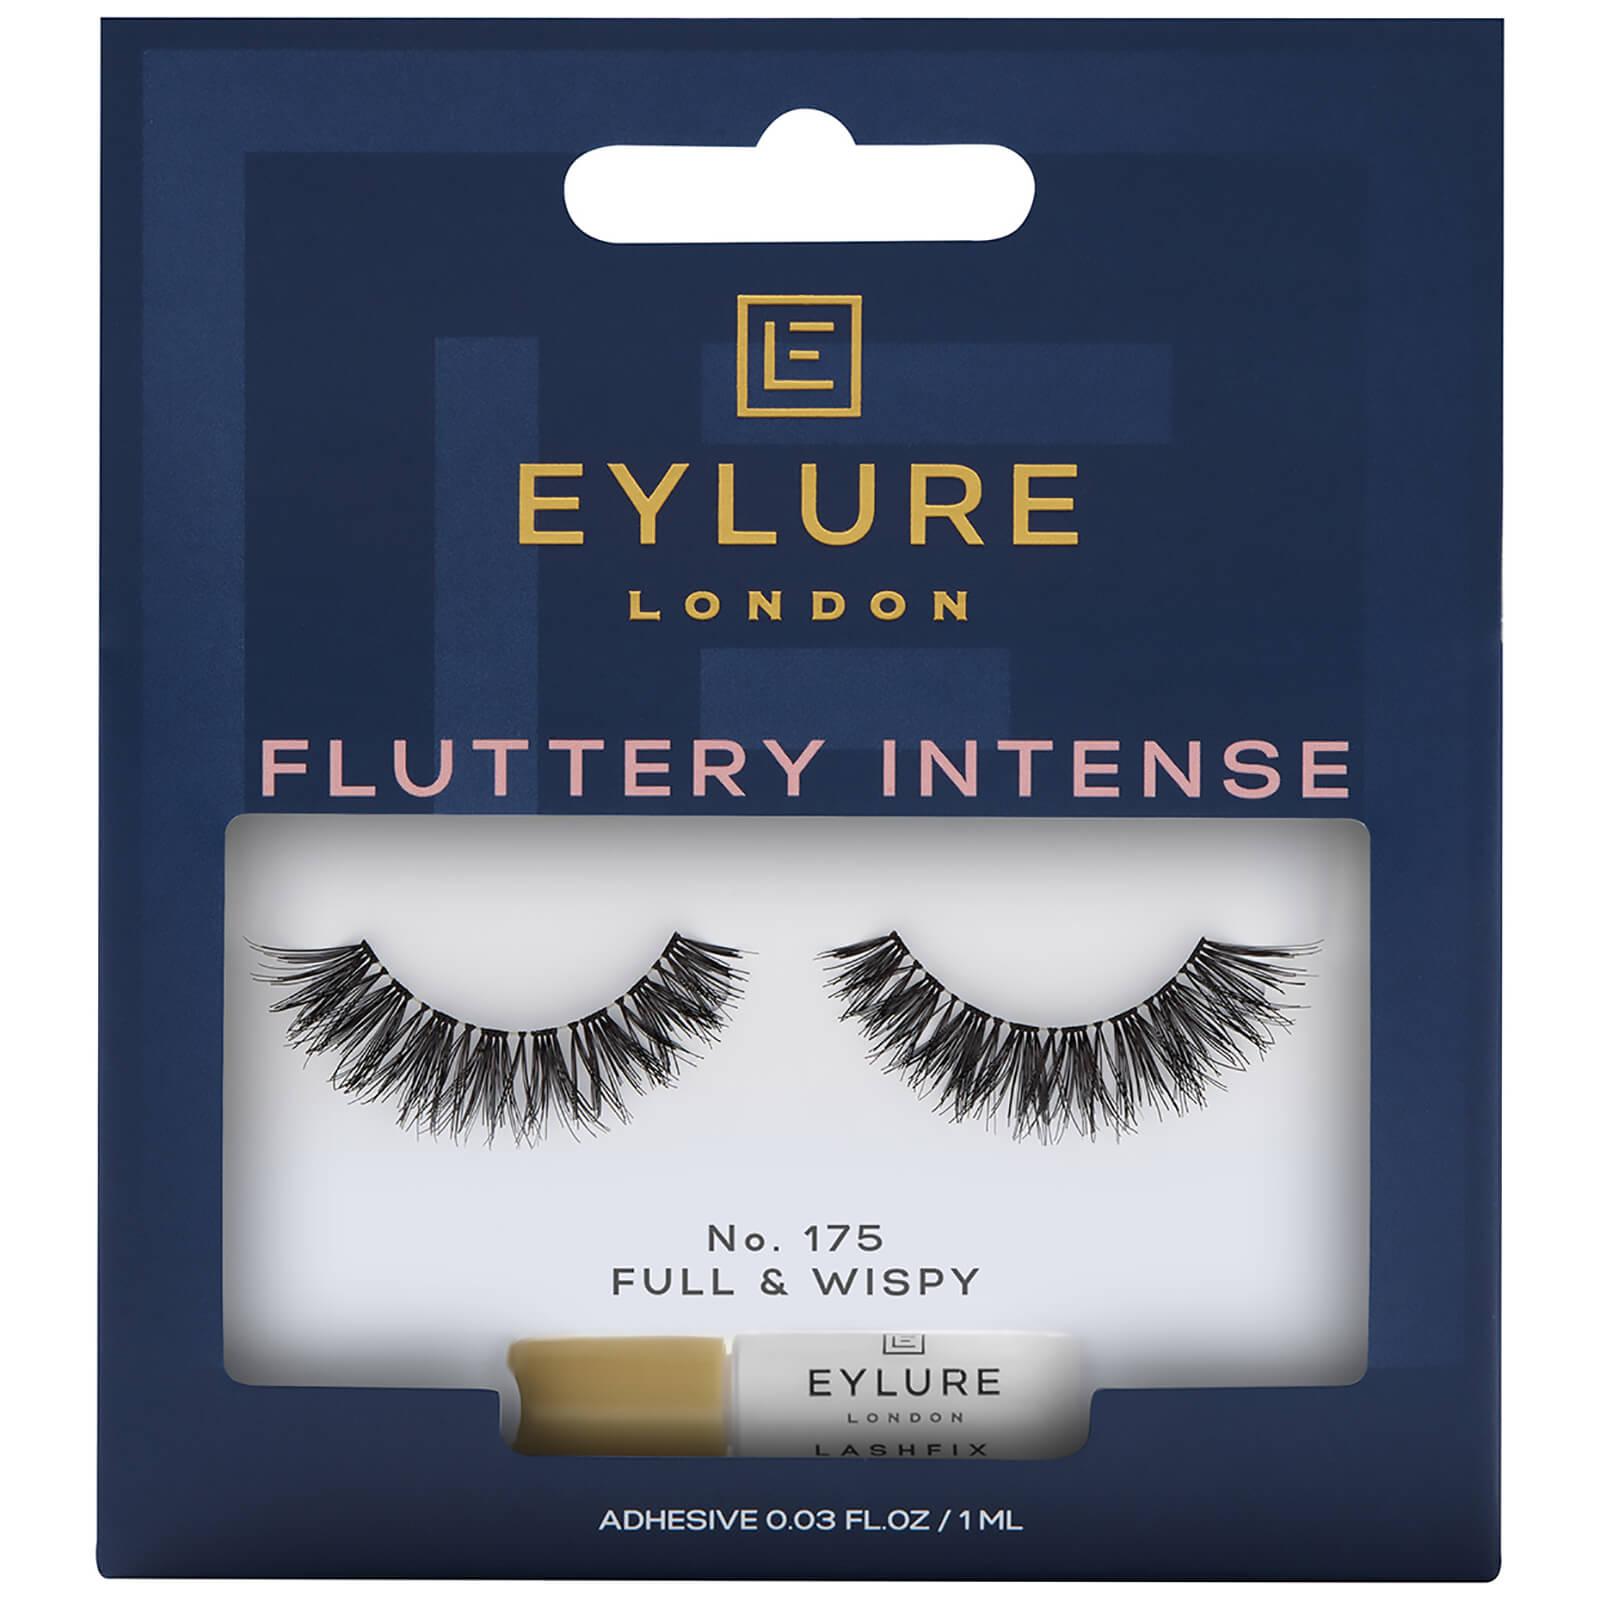 Eylure Fluttery Intense 175 Lashes